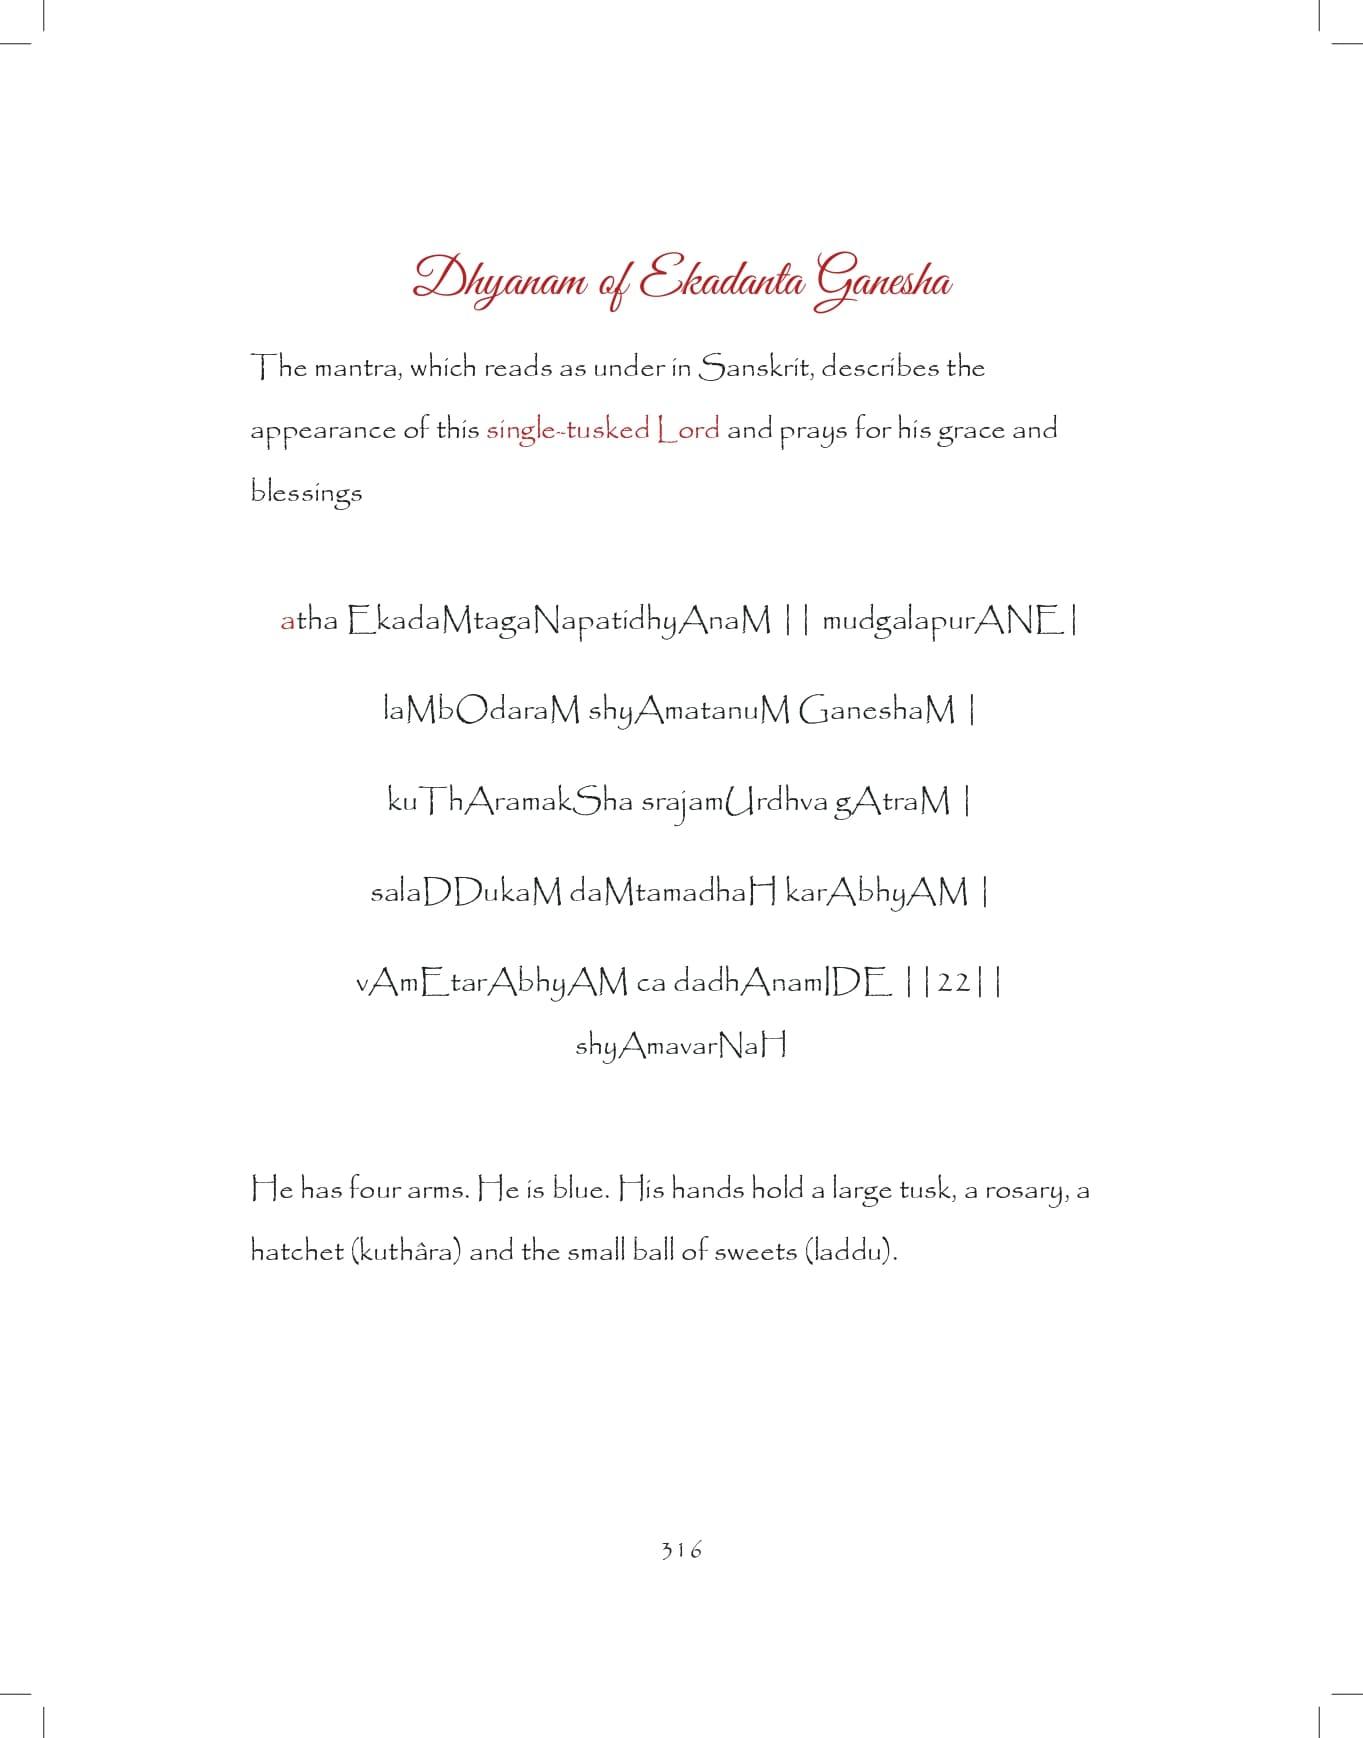 Ganesh-print_pages-to-jpg-0316.jpg